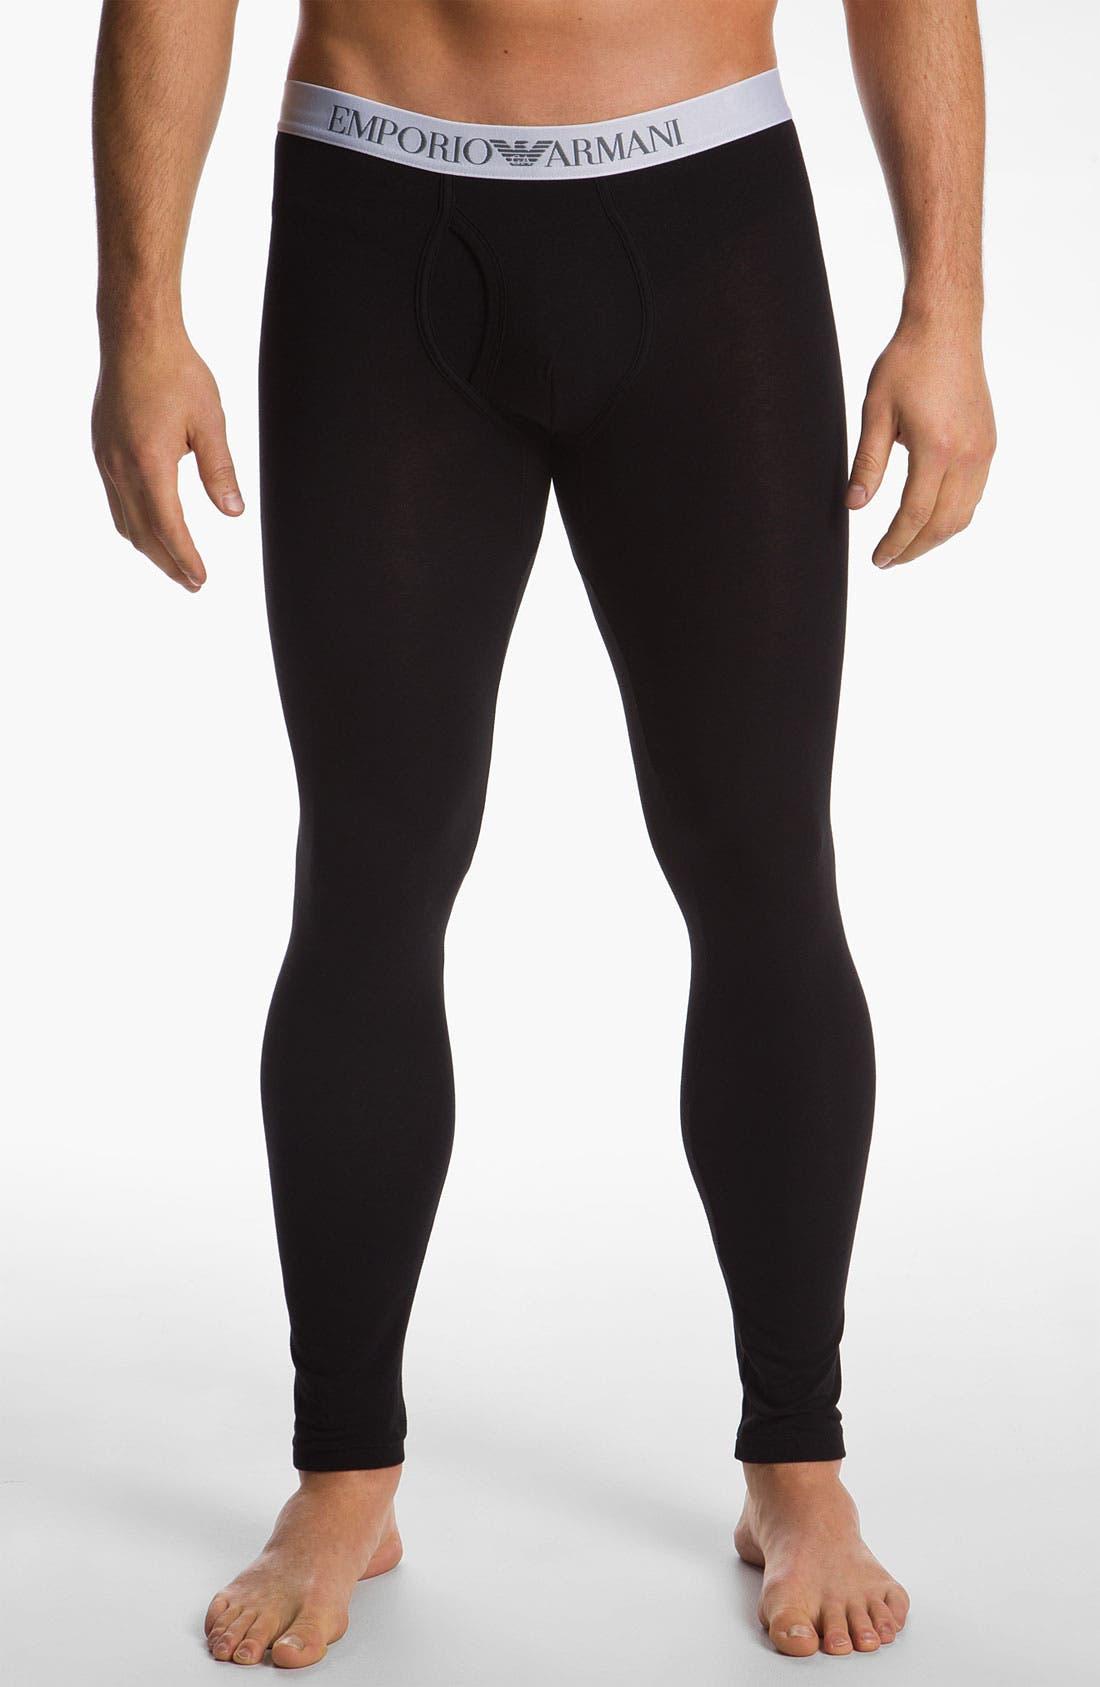 Alternate Image 1 Selected - Emporio Armani 'Basic' Stretch Leggings